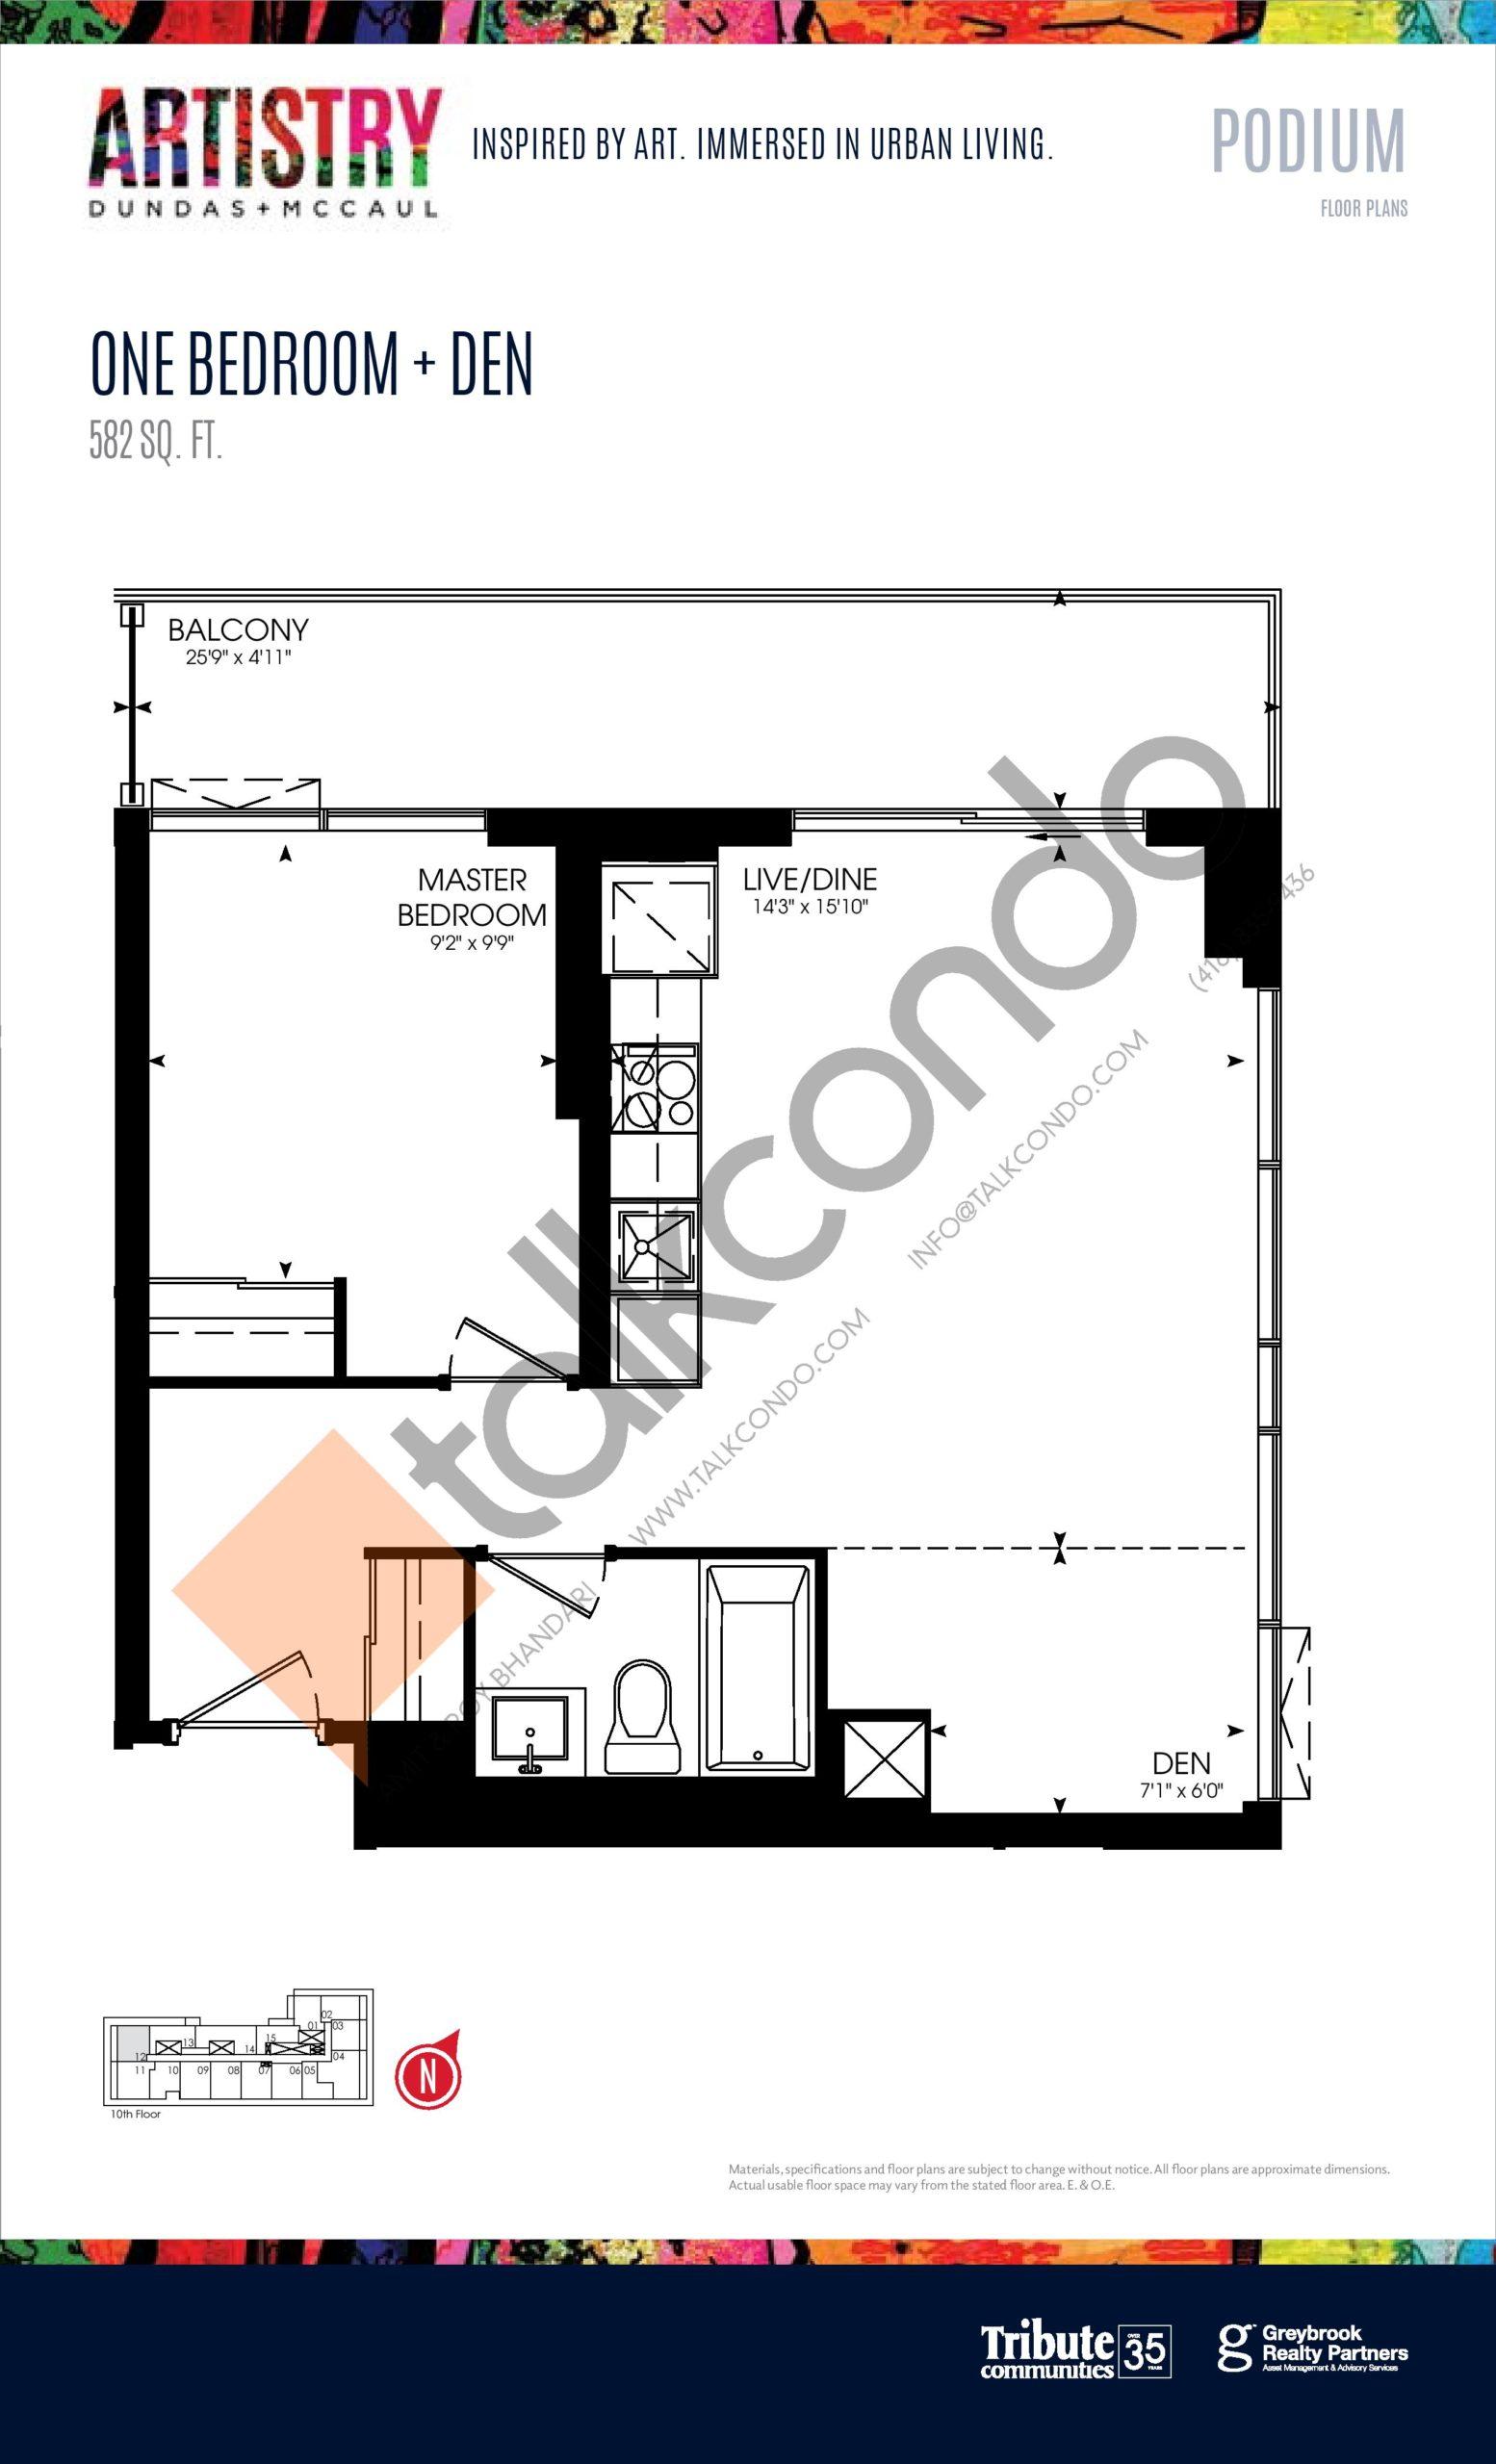 582 sq. ft. - Podium Floor Plan at Artistry Condos - 582 sq.ft